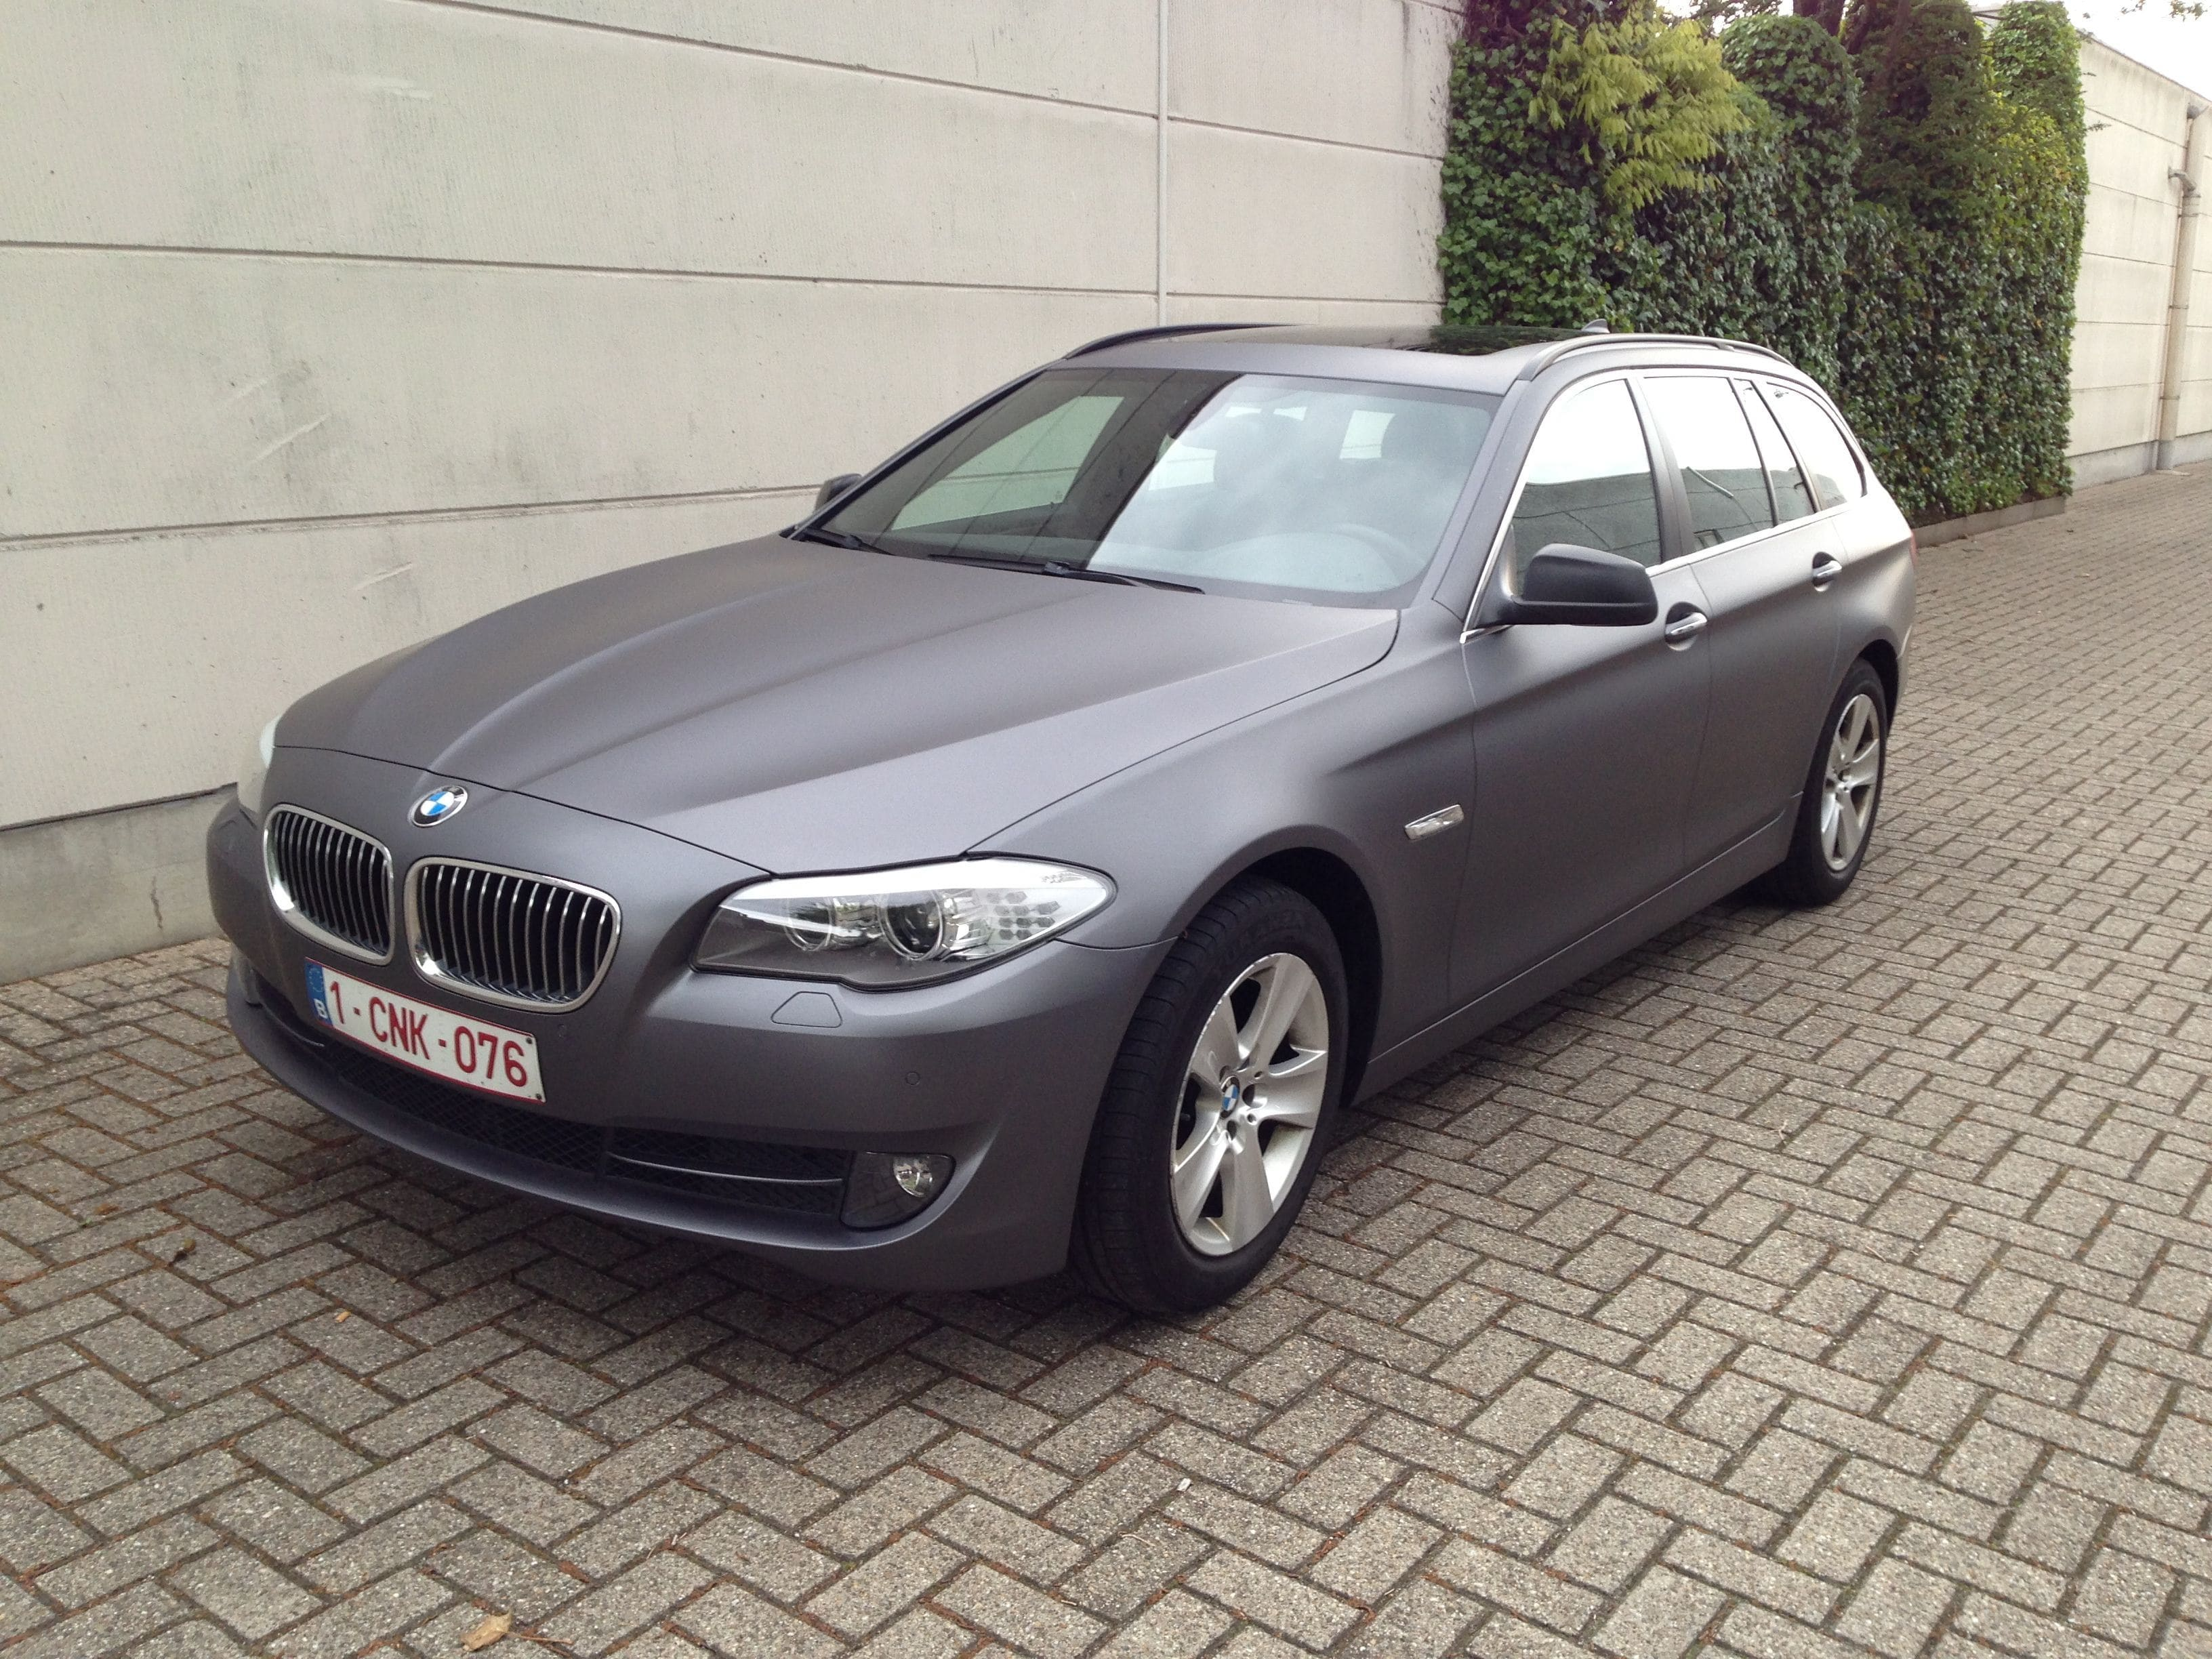 BMW 5 Serie met Gunpowder Wrap, Carwrapping door Wrapmyride.nu Foto-nr:5263, ©2021